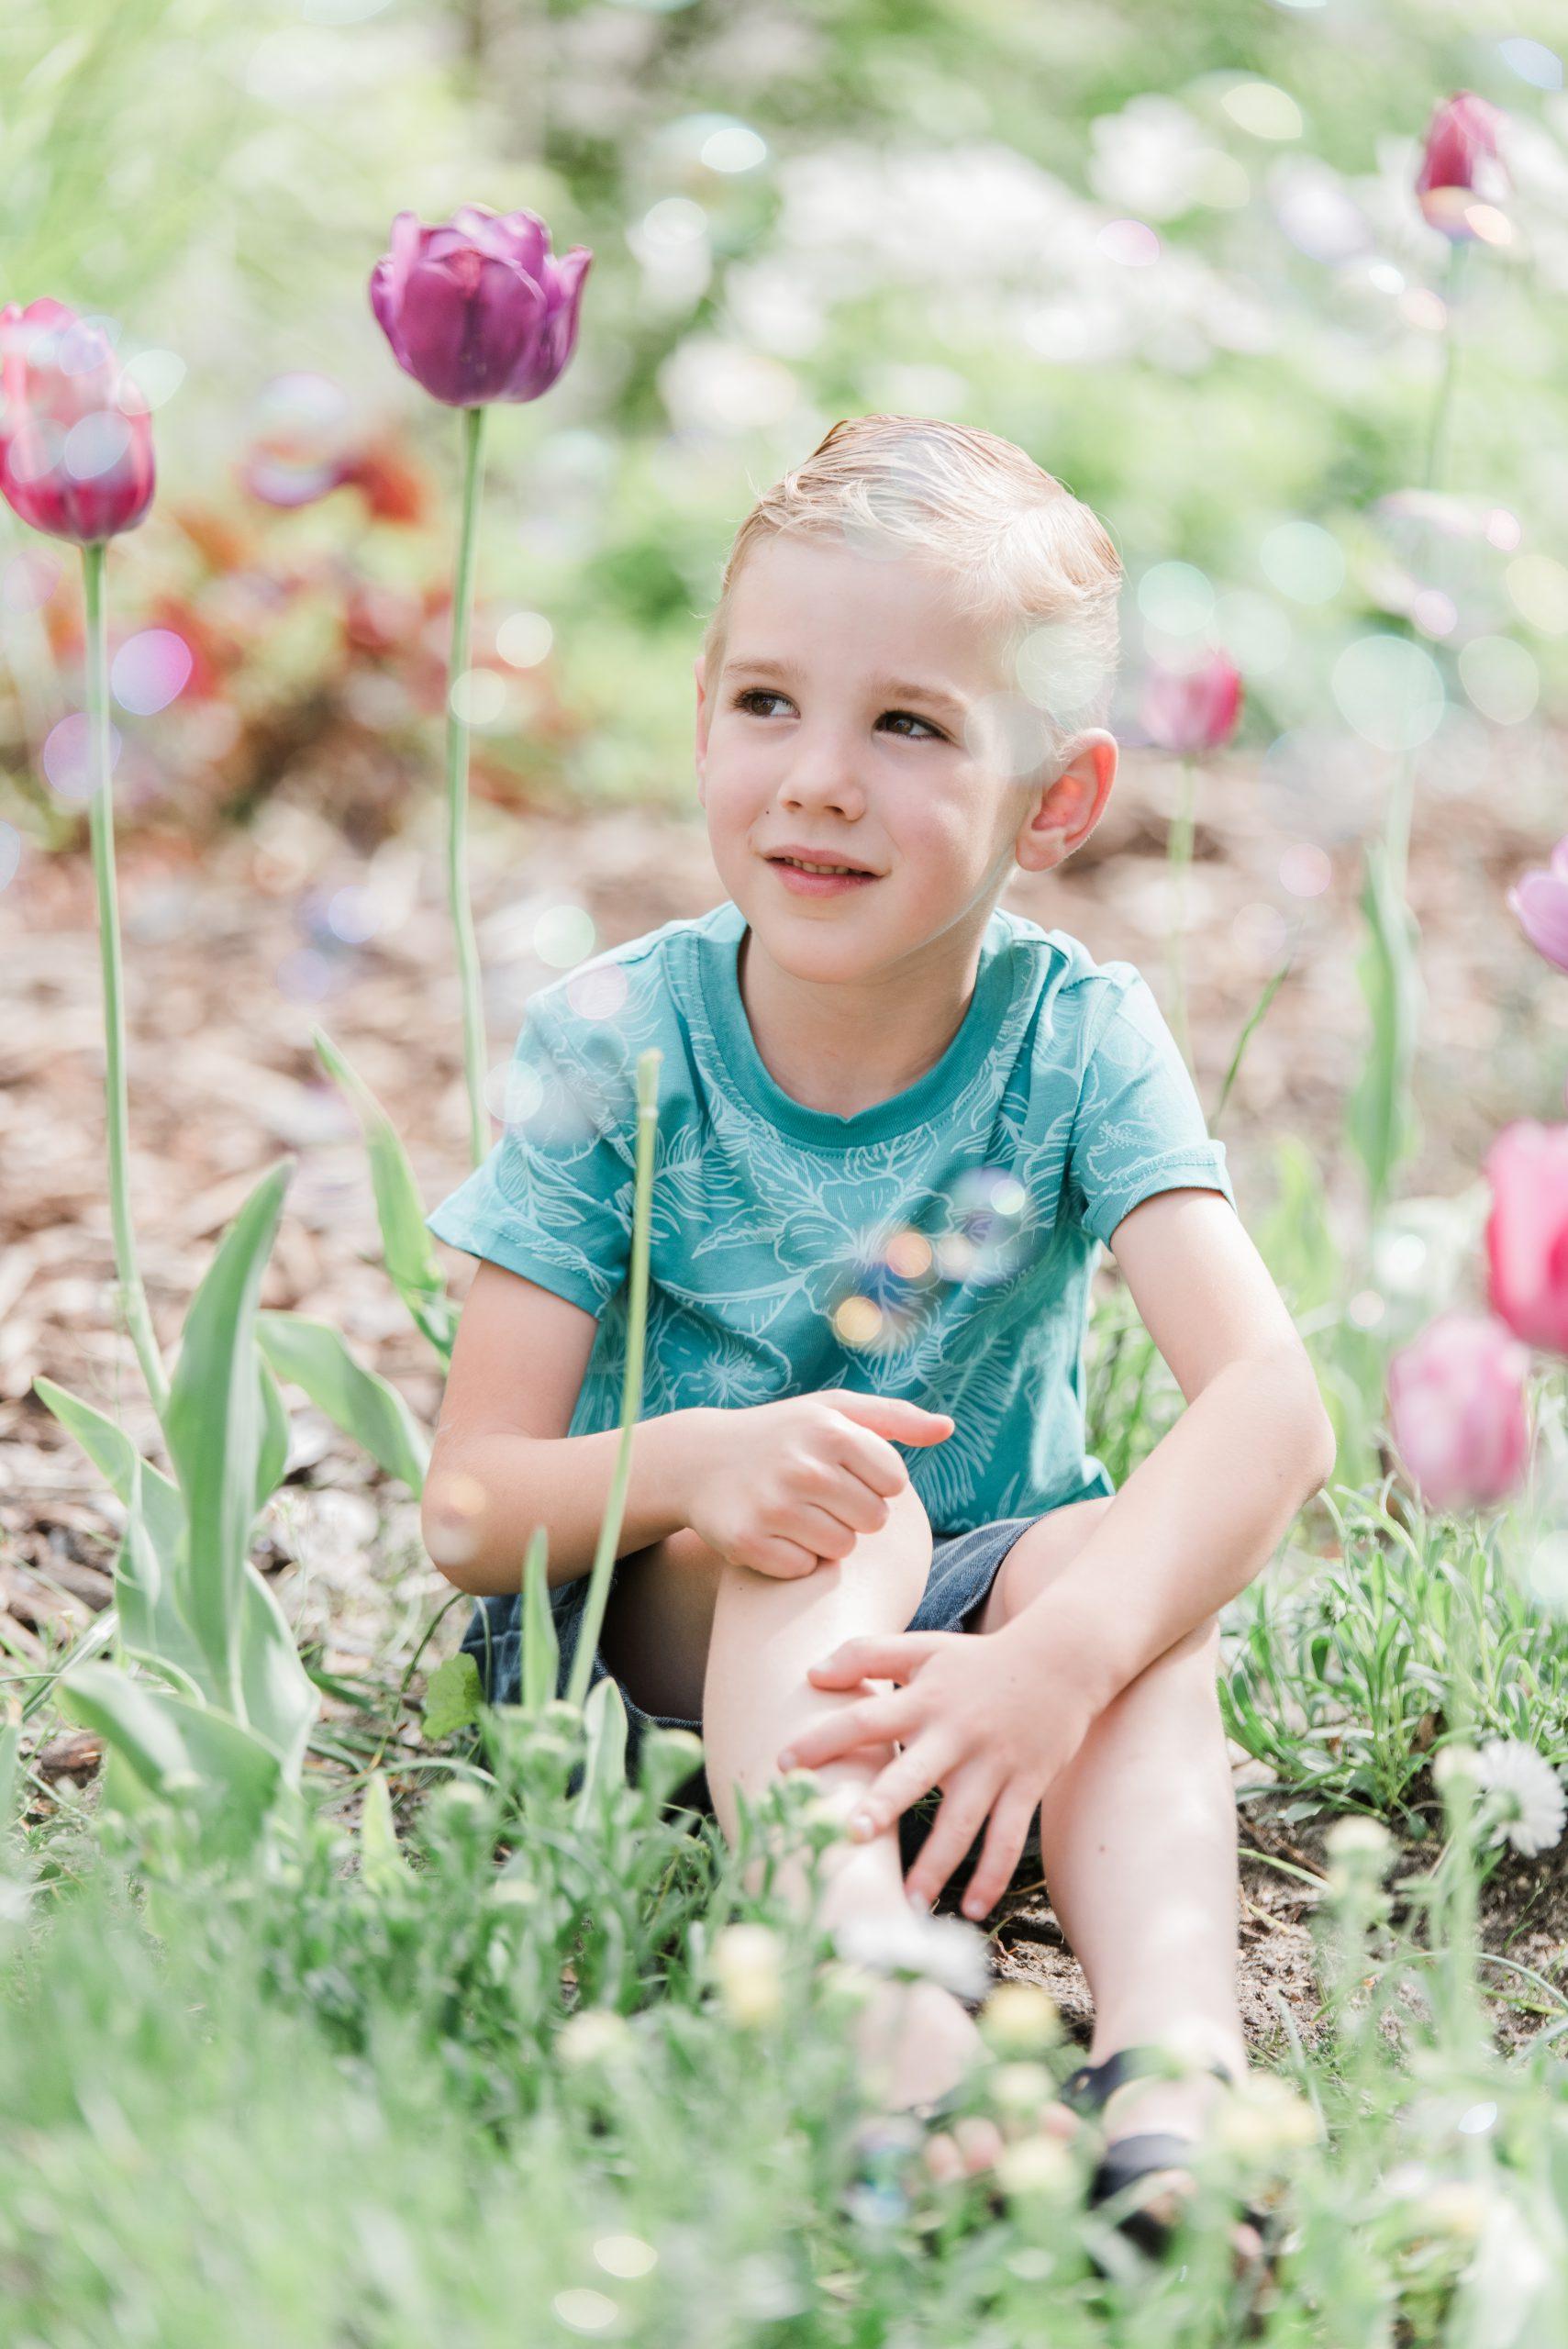 Chantal-Nijhof-Studio-Fotografie-Familiefotoshoot-Kinder-fotoshoot-Kids-fotosessie-4-scaled